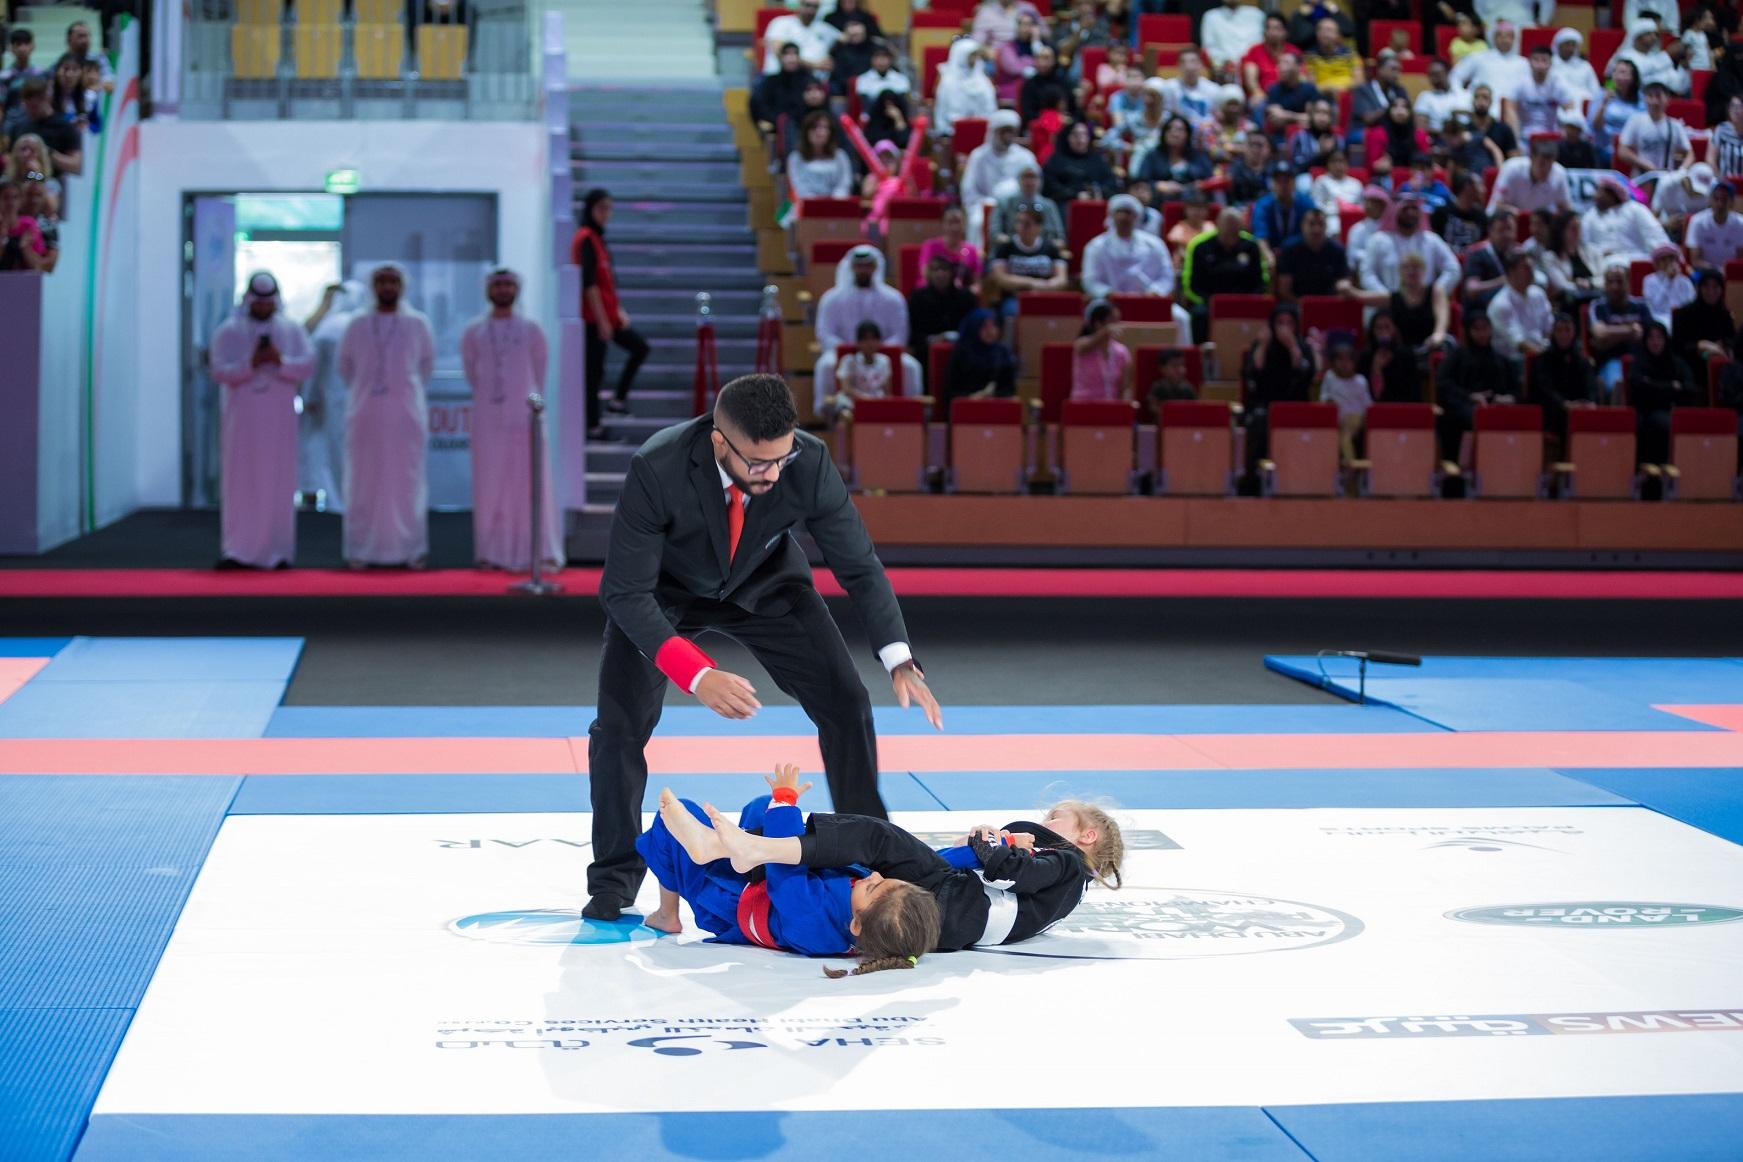 abu dhabi world professional jiu-jitsu championship shows jiu-jitsu is a sport for all 2.jpg